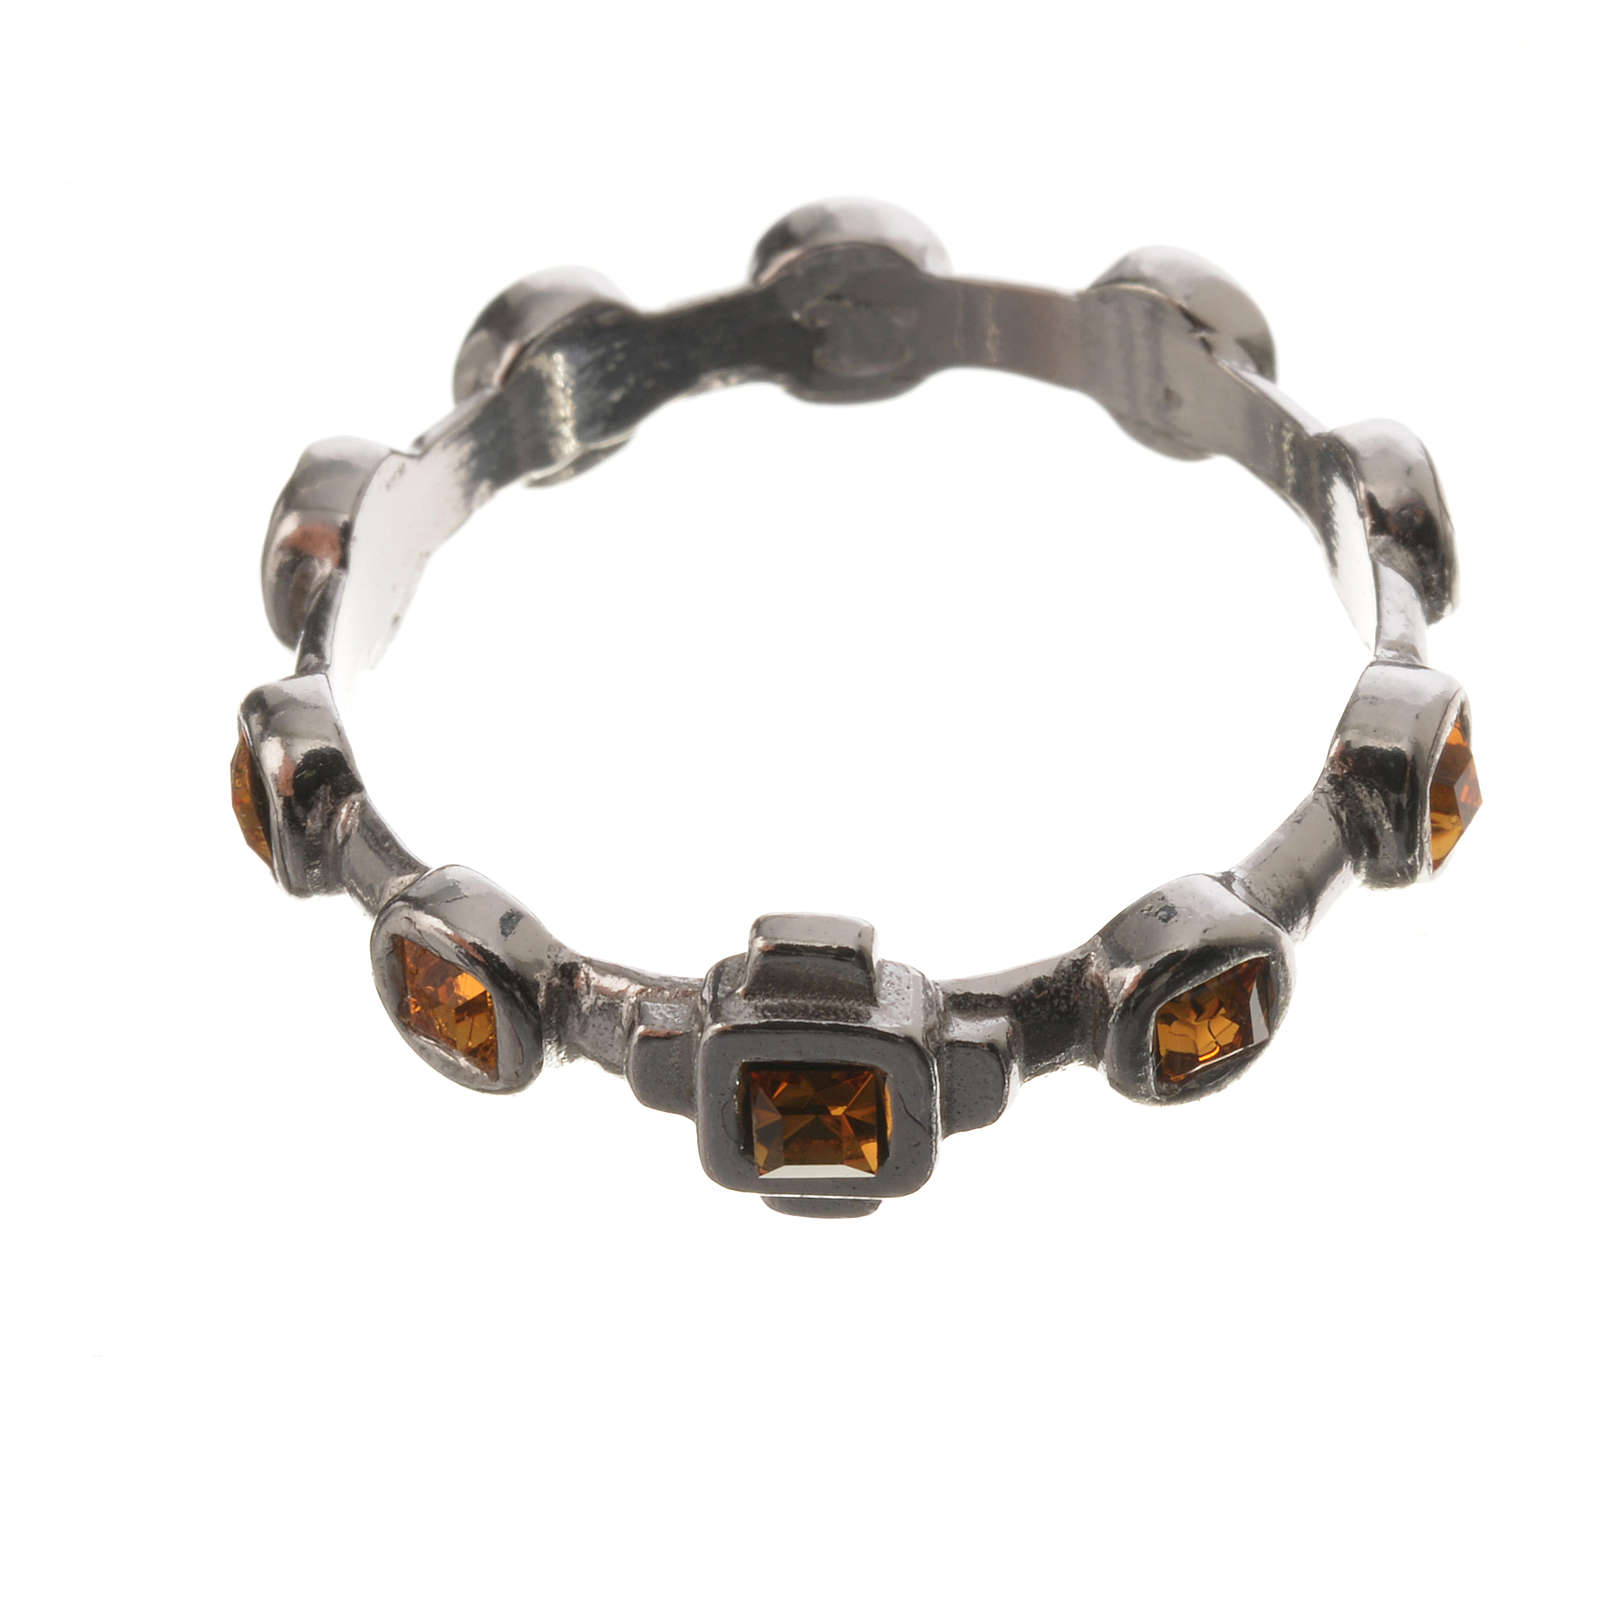 Single-decade ring in 800 silver and yellow Swarovski 3